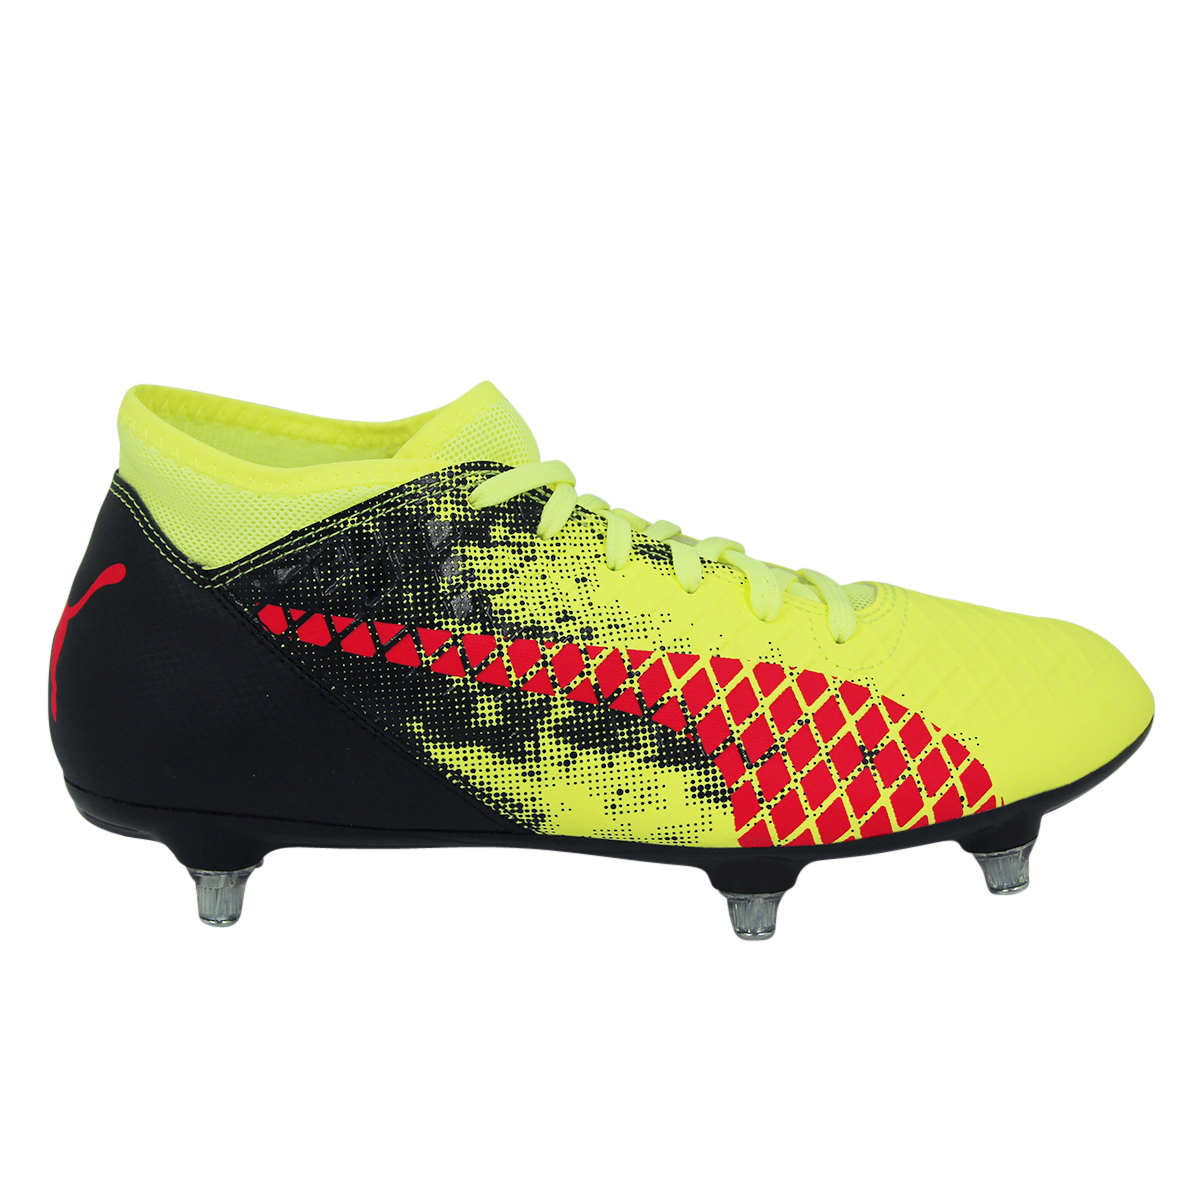 Puma Football Future 19.2 Netfit Chaussures de football pour terrain dur Rouge